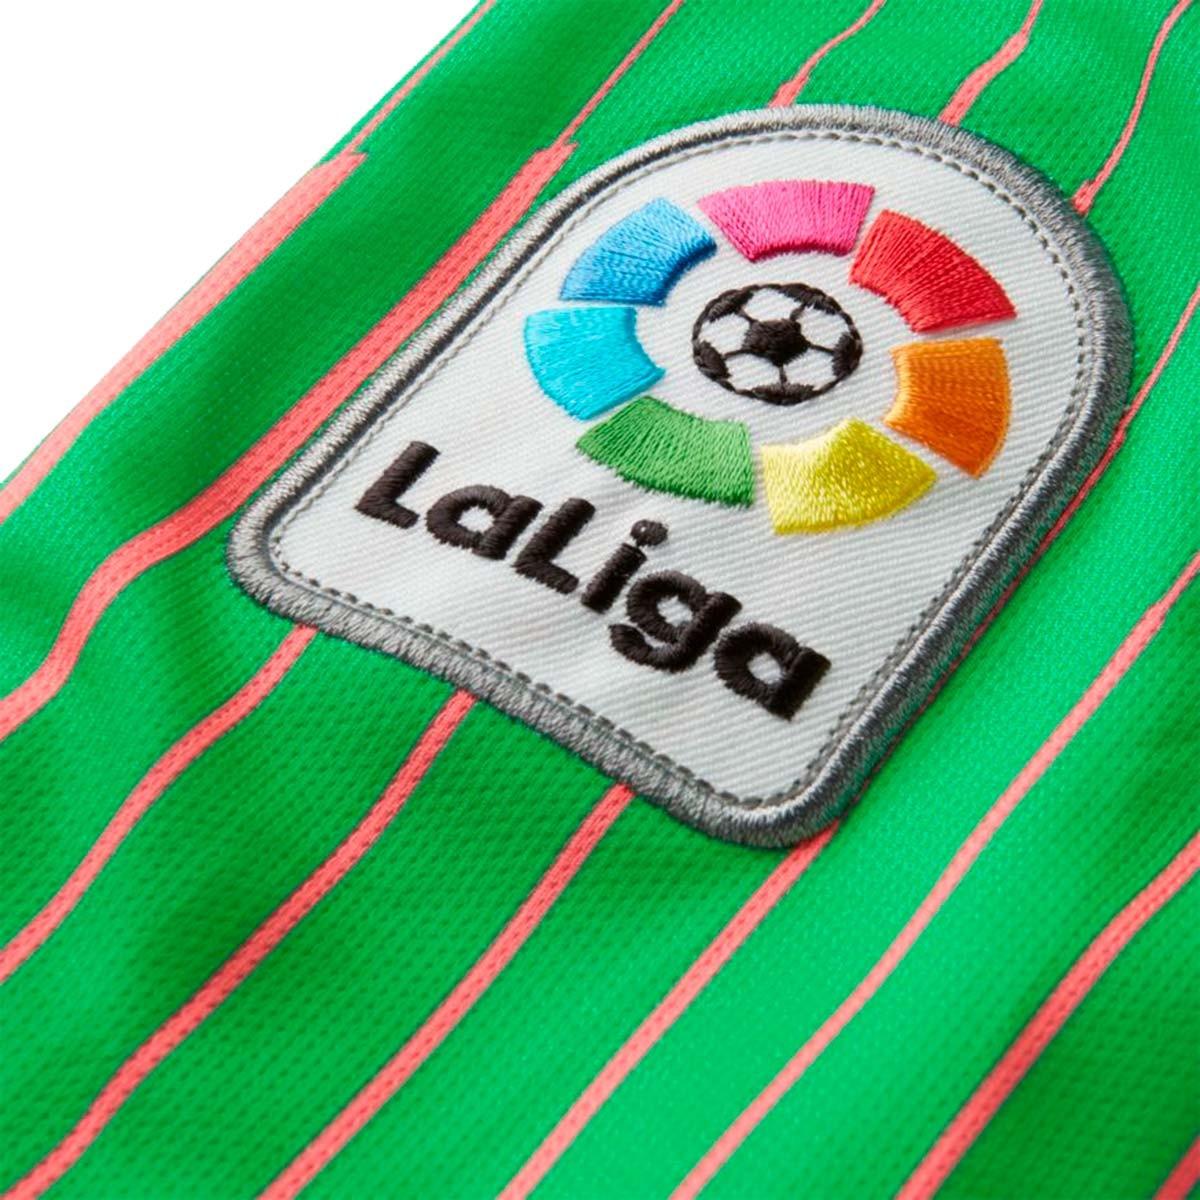 ... Barcelona Stadium Portero 2018-2019 Green strike-Green spark-Black.  Categorías de la Camiseta b1a51b051c822